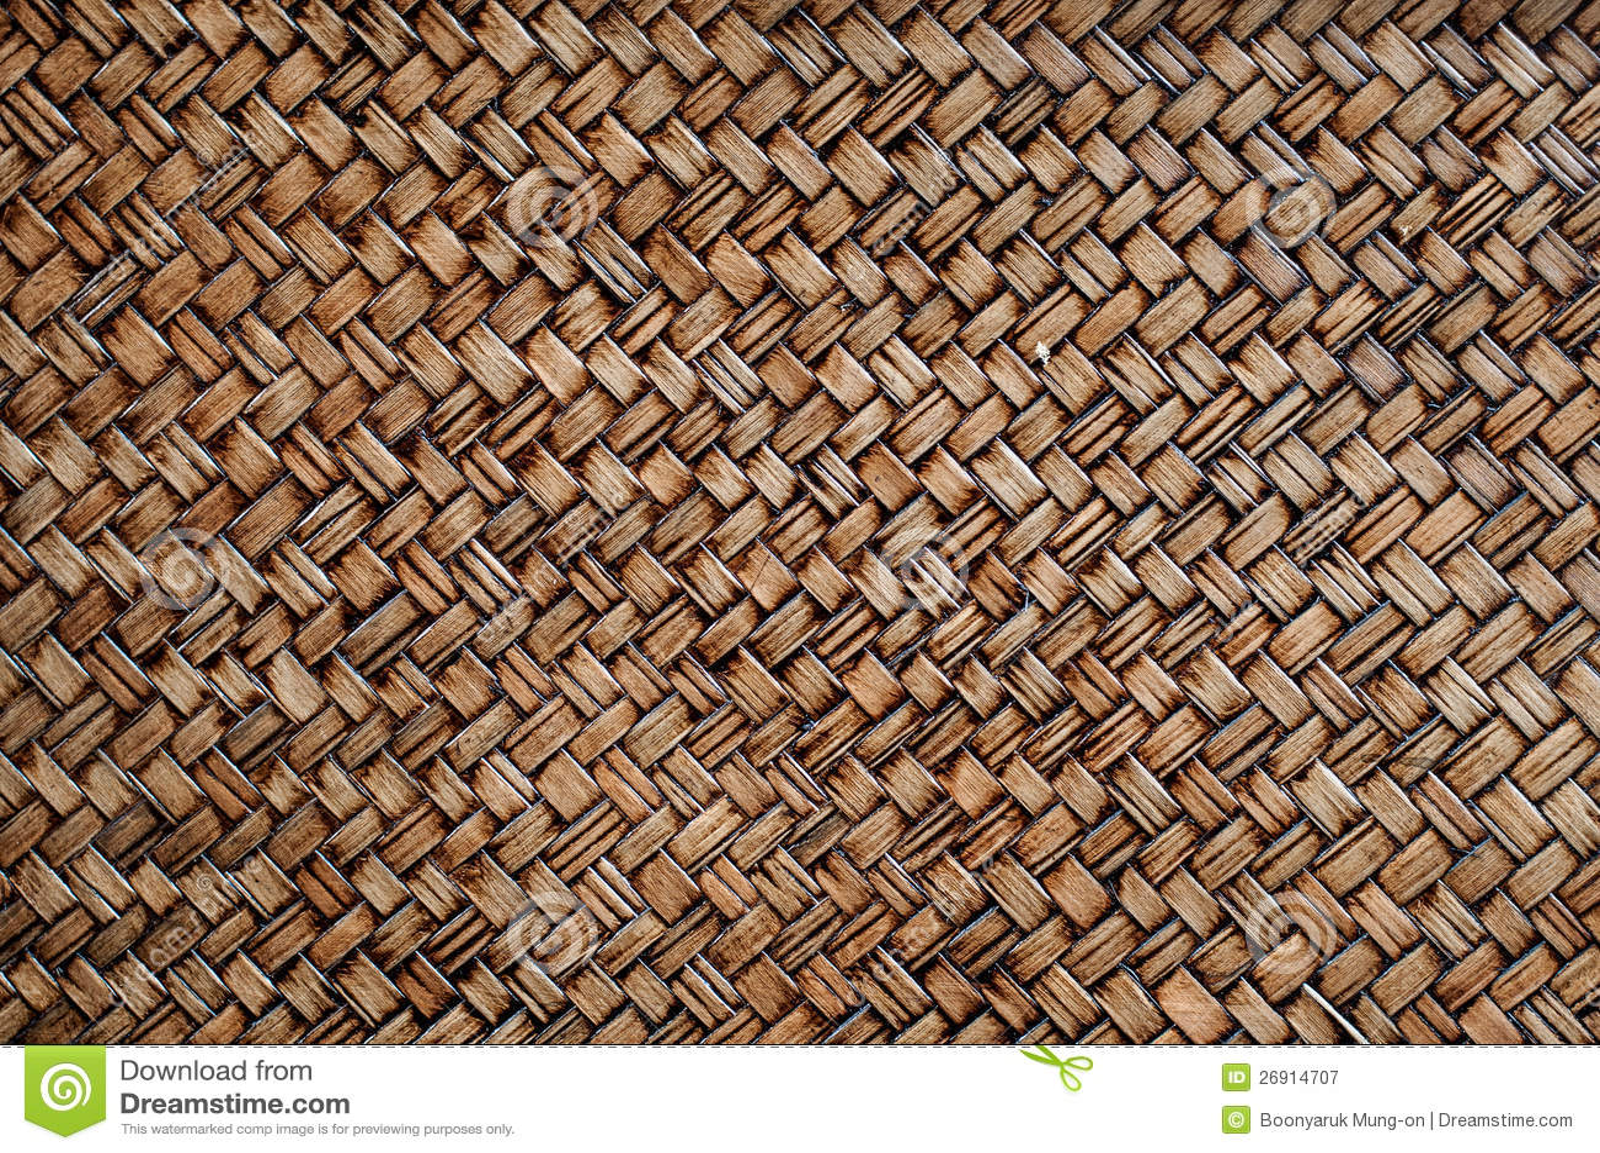 Braided Brushwood Bamboo Basket Texture Royalty Free Stock Photography ...